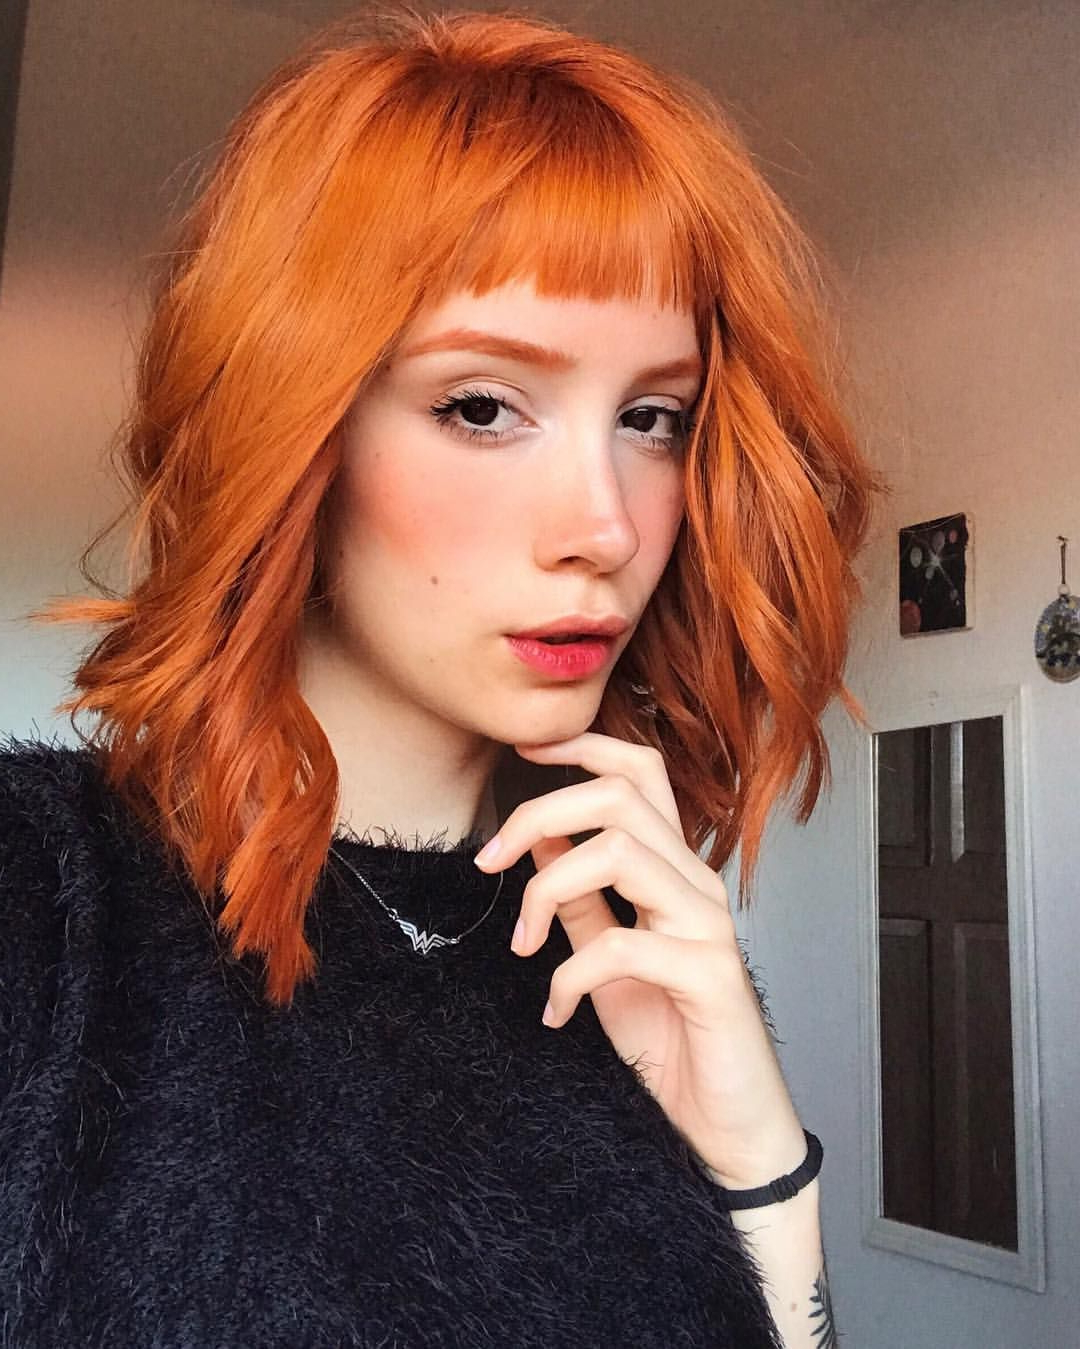 Ginger Hair, Short Bangs | Short Bangs In 2018 | Pinterest | Hair Regarding Short Hairstyles With Red Hair (View 7 of 25)